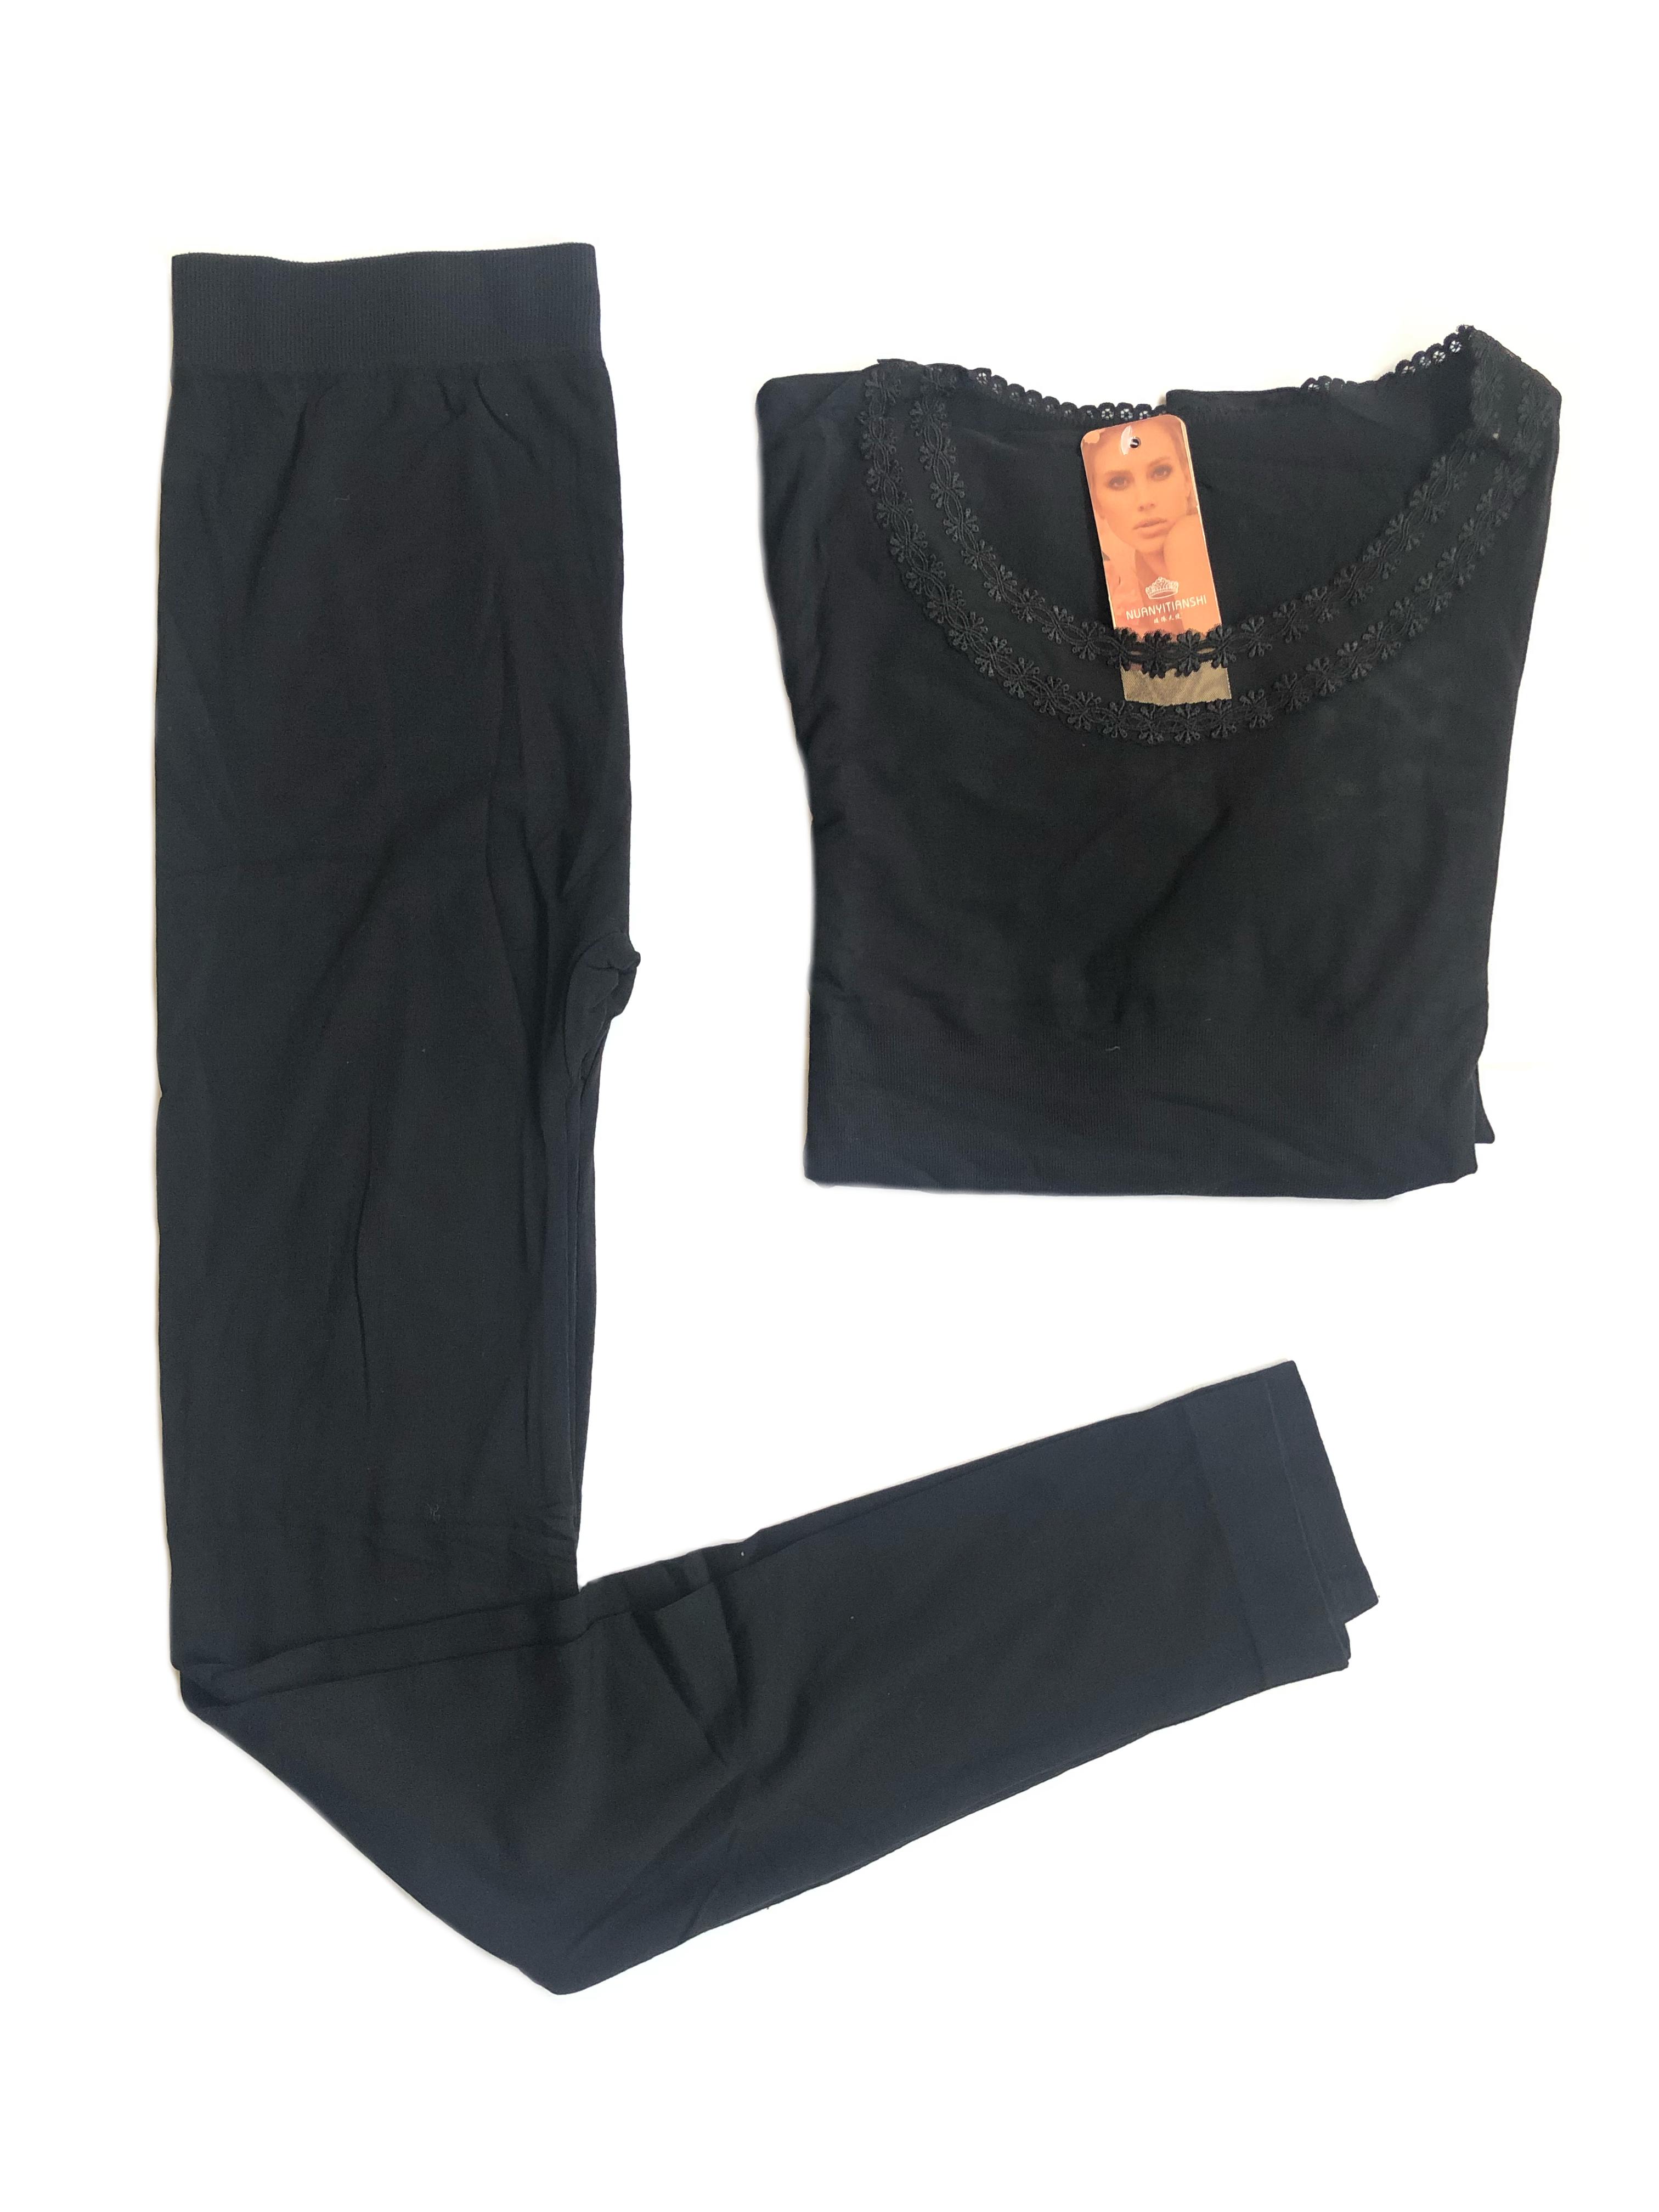 Black Thin Thermal Set